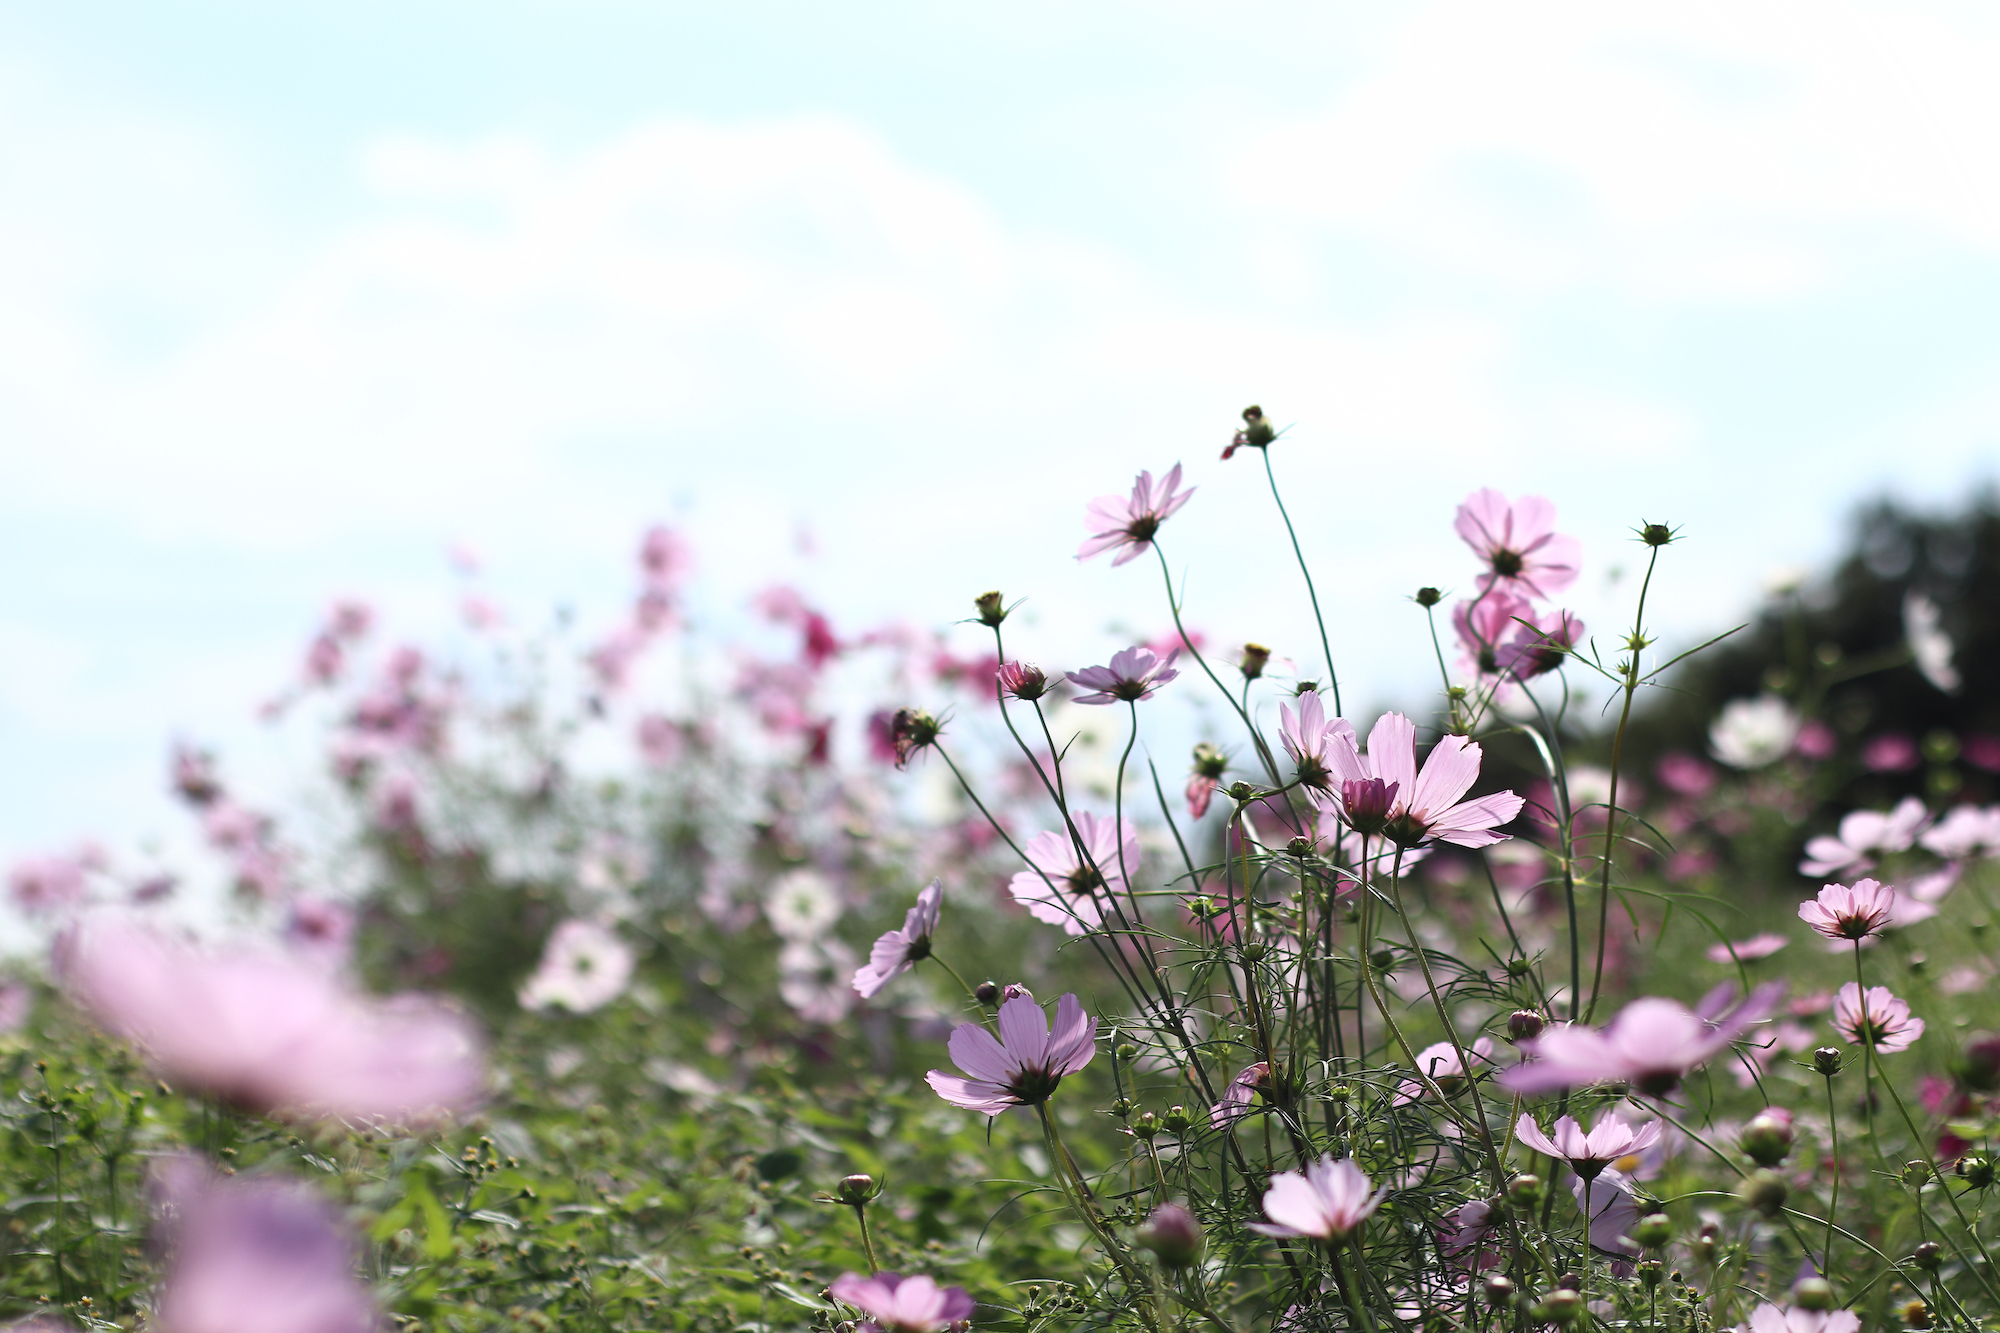 Fresh flowers in spring